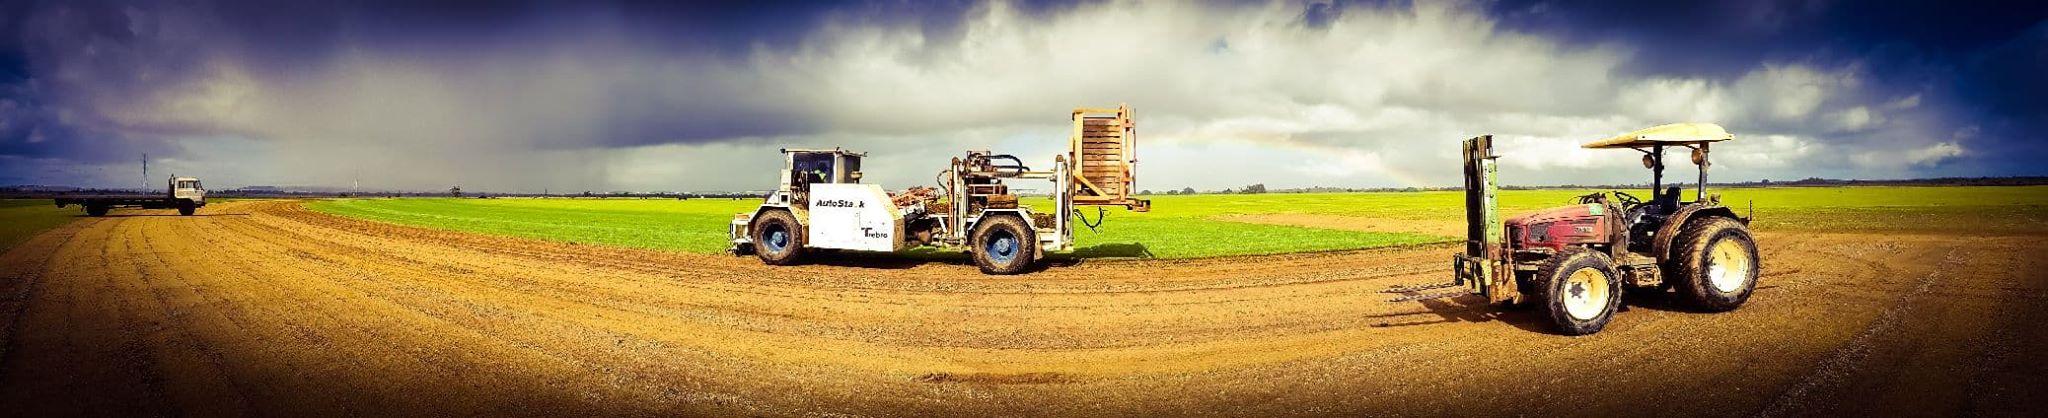 Action shot taken on the farm in Regans Ford